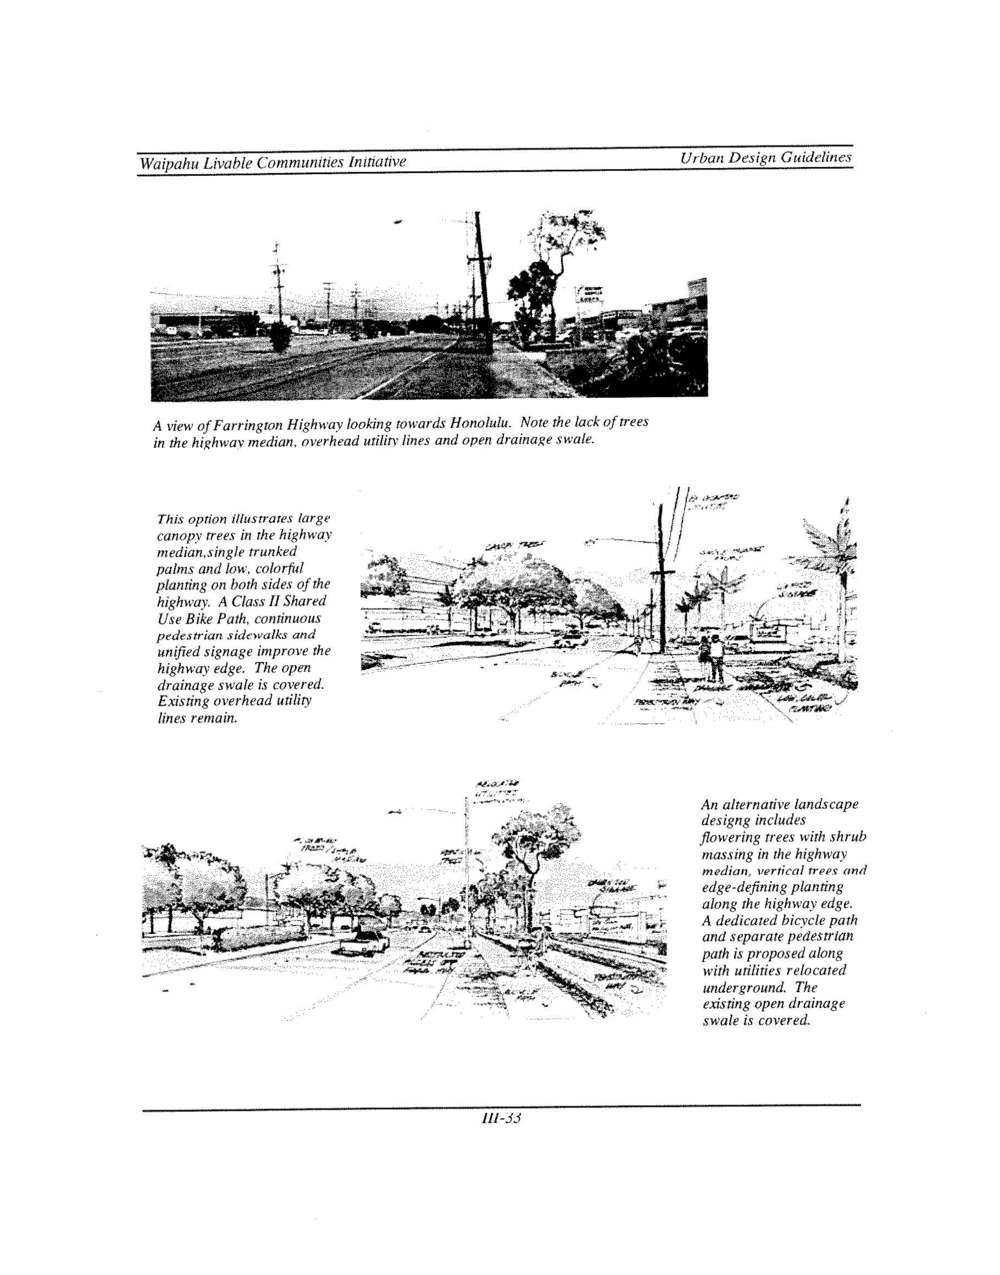 160531_WaipahuLivableCommunities(1998)_Page_123.jpg